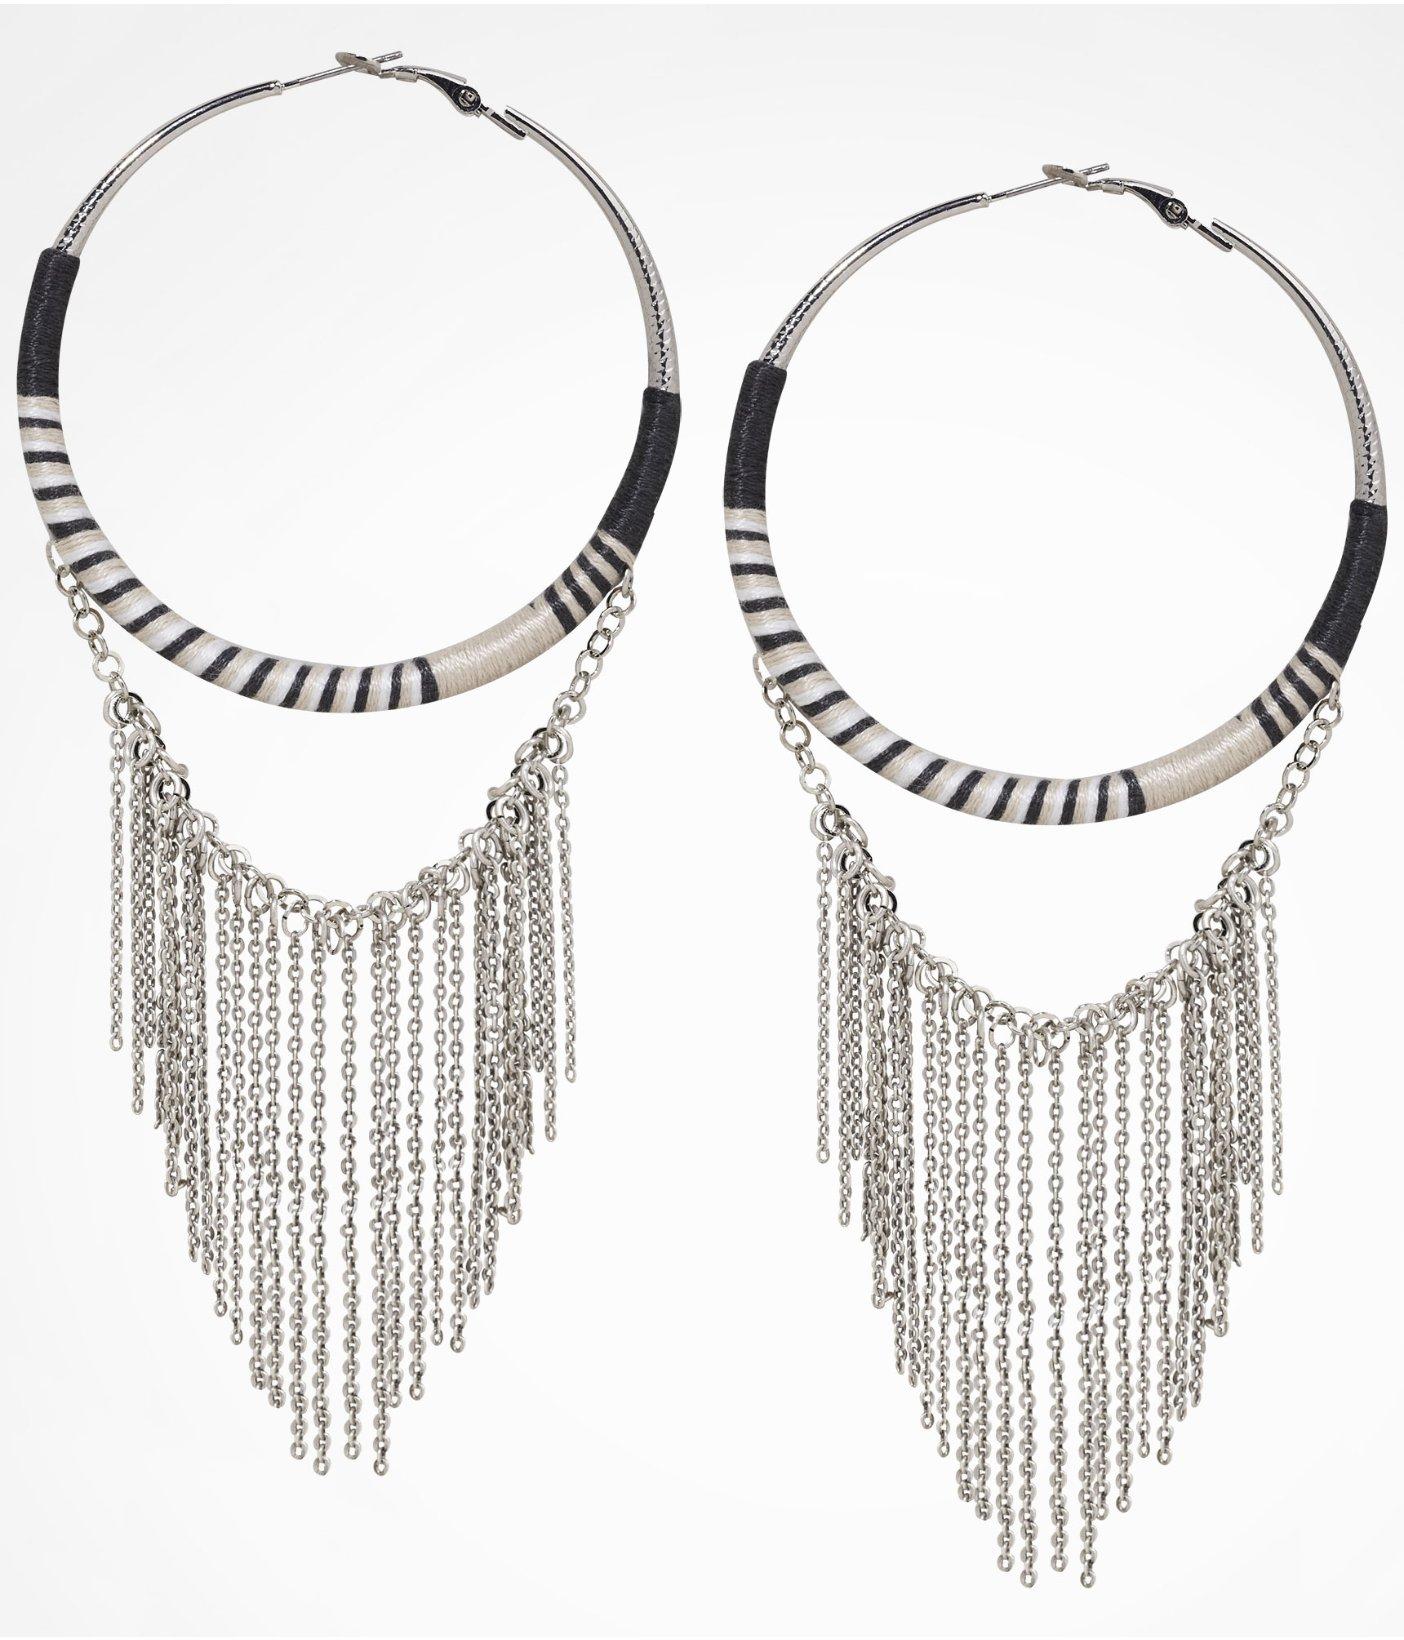 Lyst Express Thread Wrapped Chain Fringe Hoop Earrings in Metallic